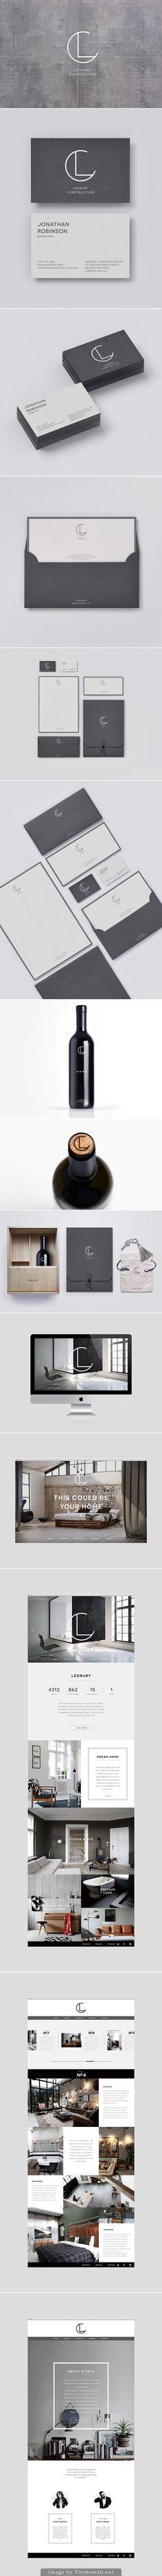 Combination Mark Typography Graphicdesign Webdesign Ledbury Construction Graphic Design Branding Business Design Graphic Design Logo